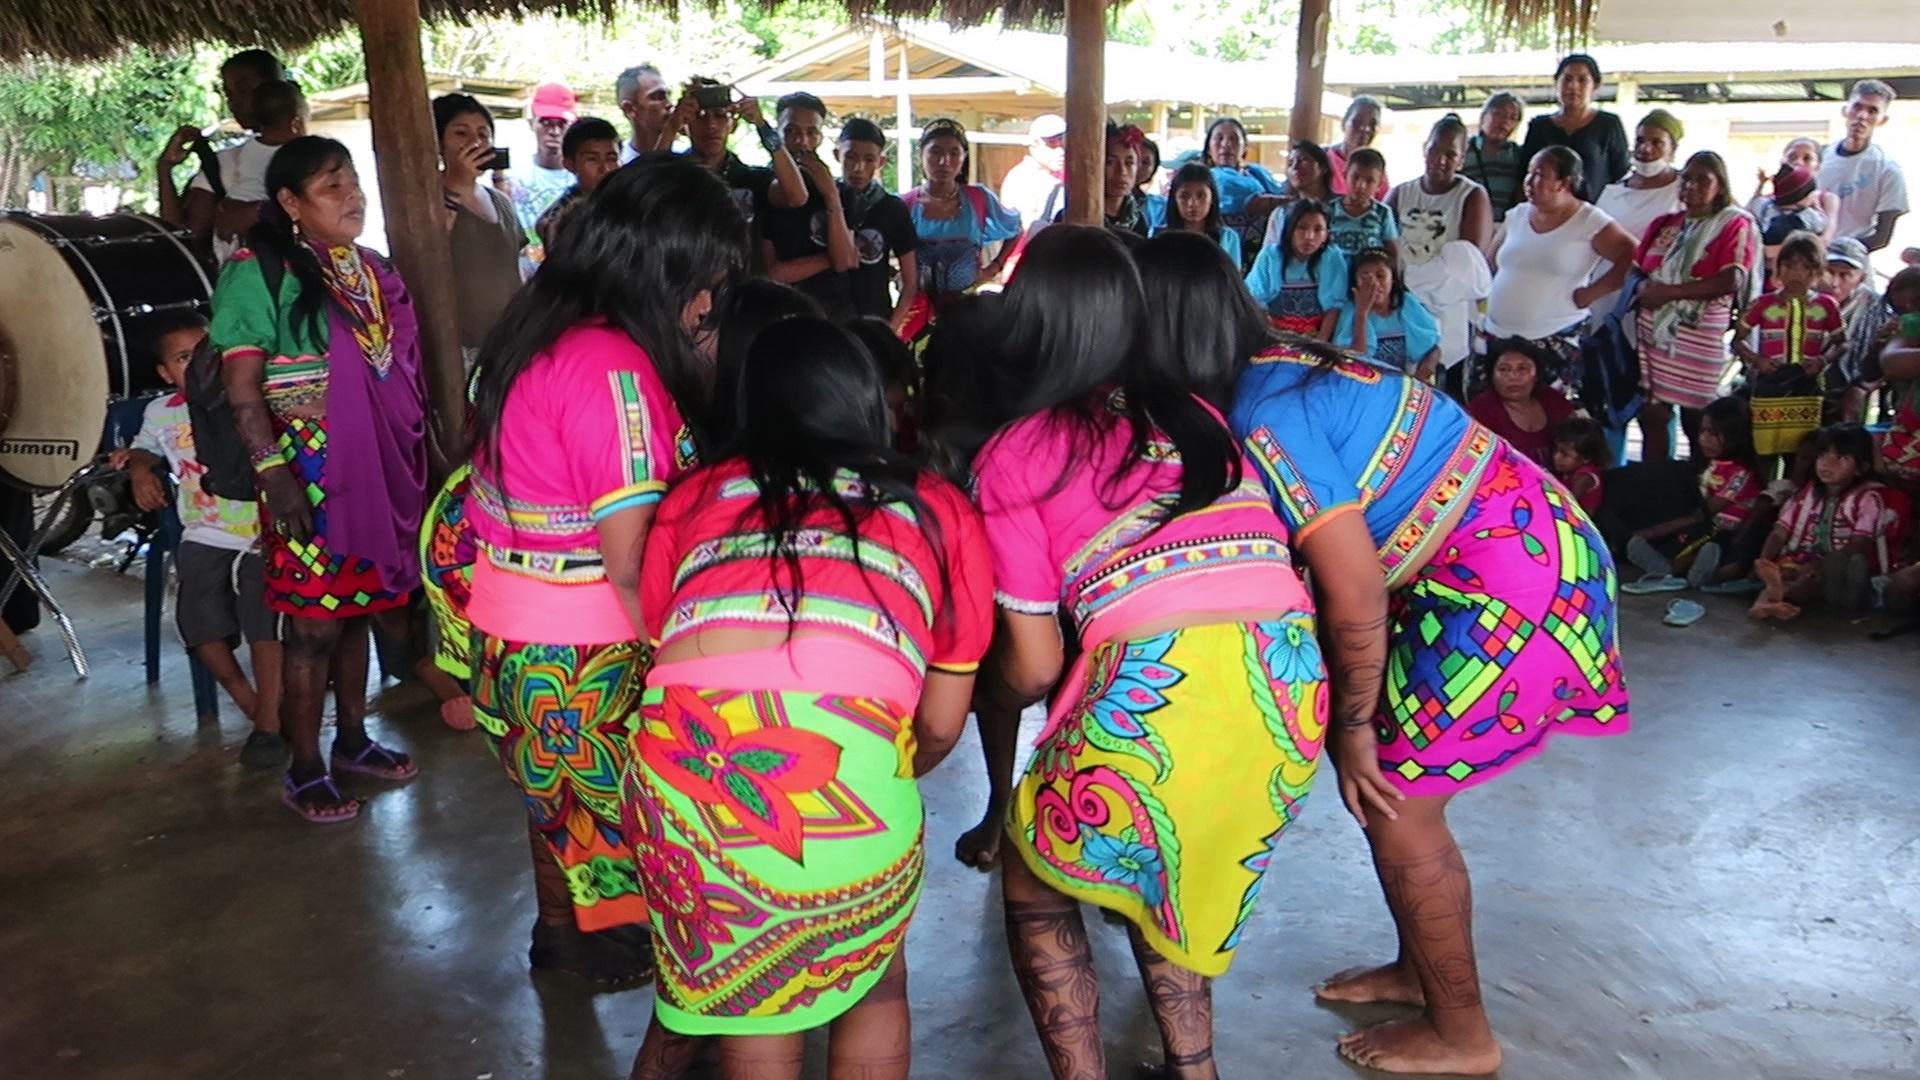 Cuti embera community dances